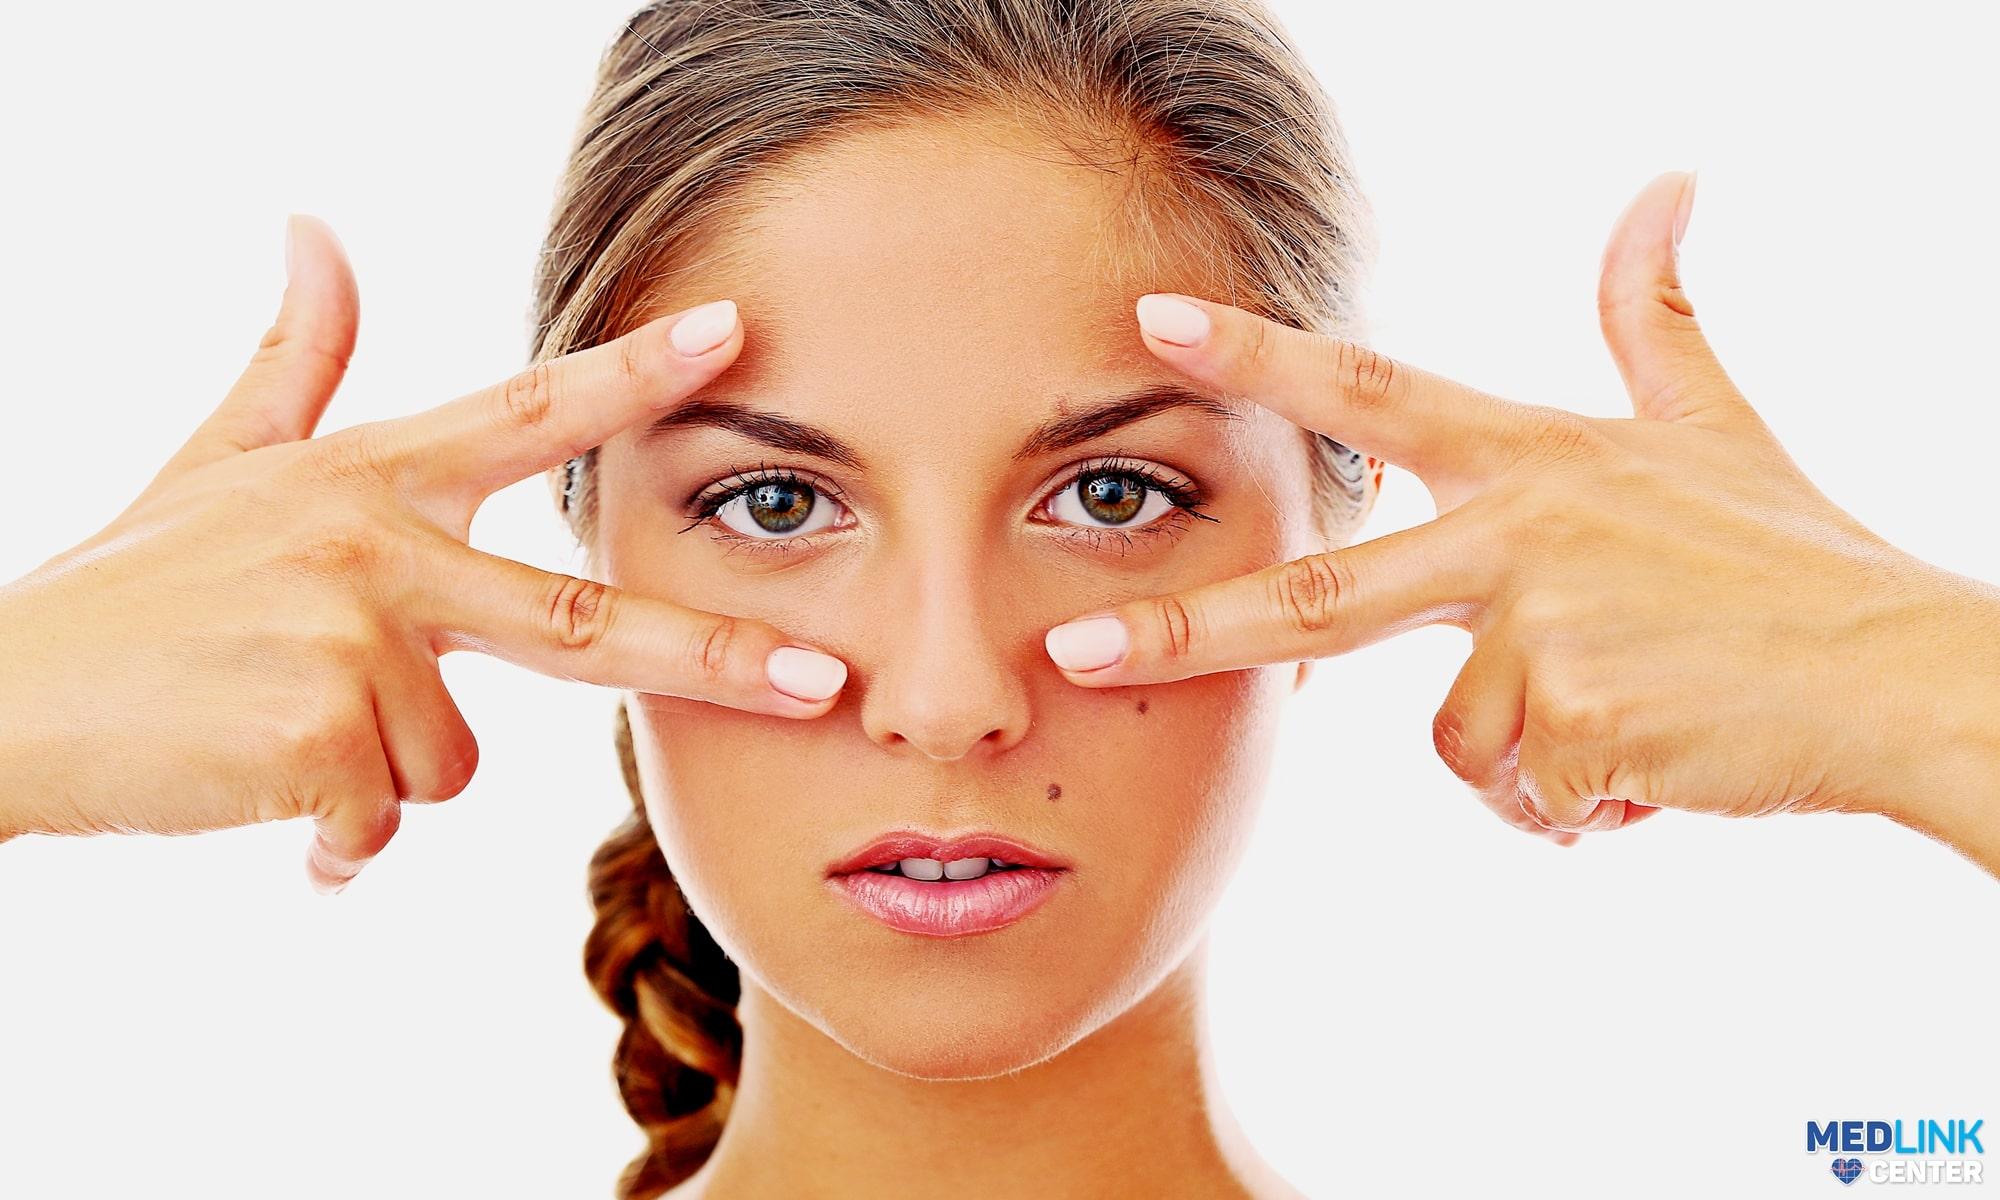 tratament botox tratament riduri laba gastii clinica medlink craiova